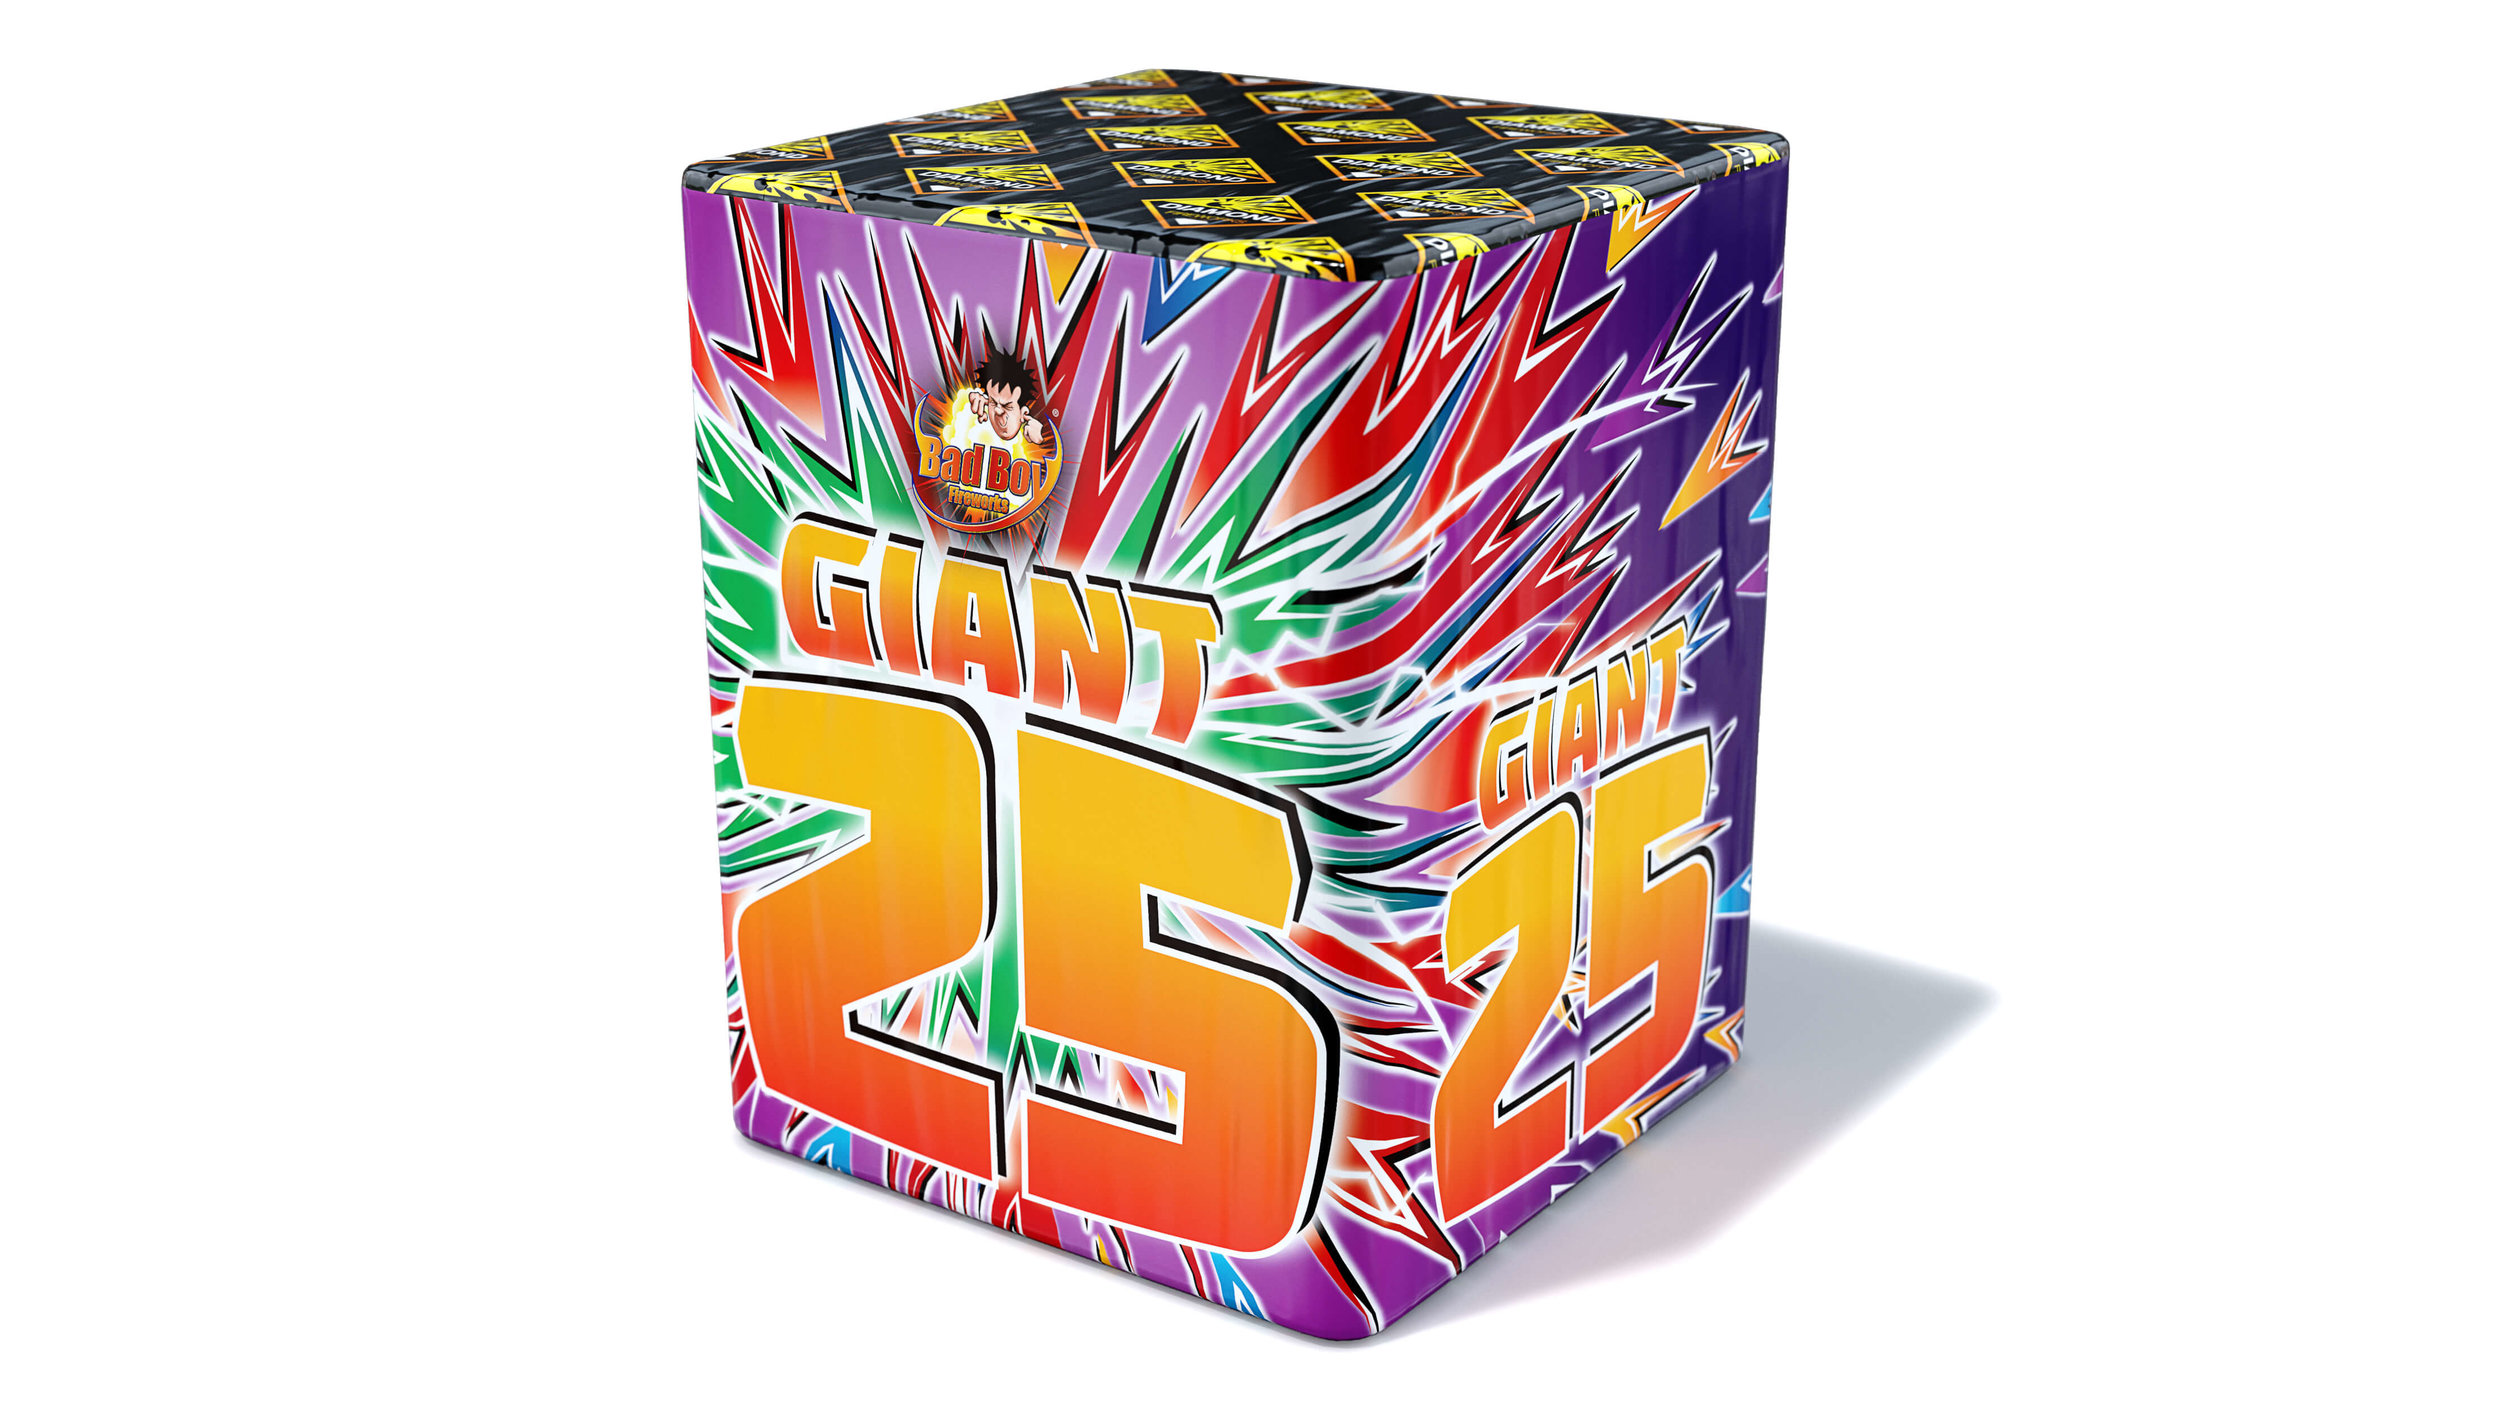 Giant 25 Shot - £65.00